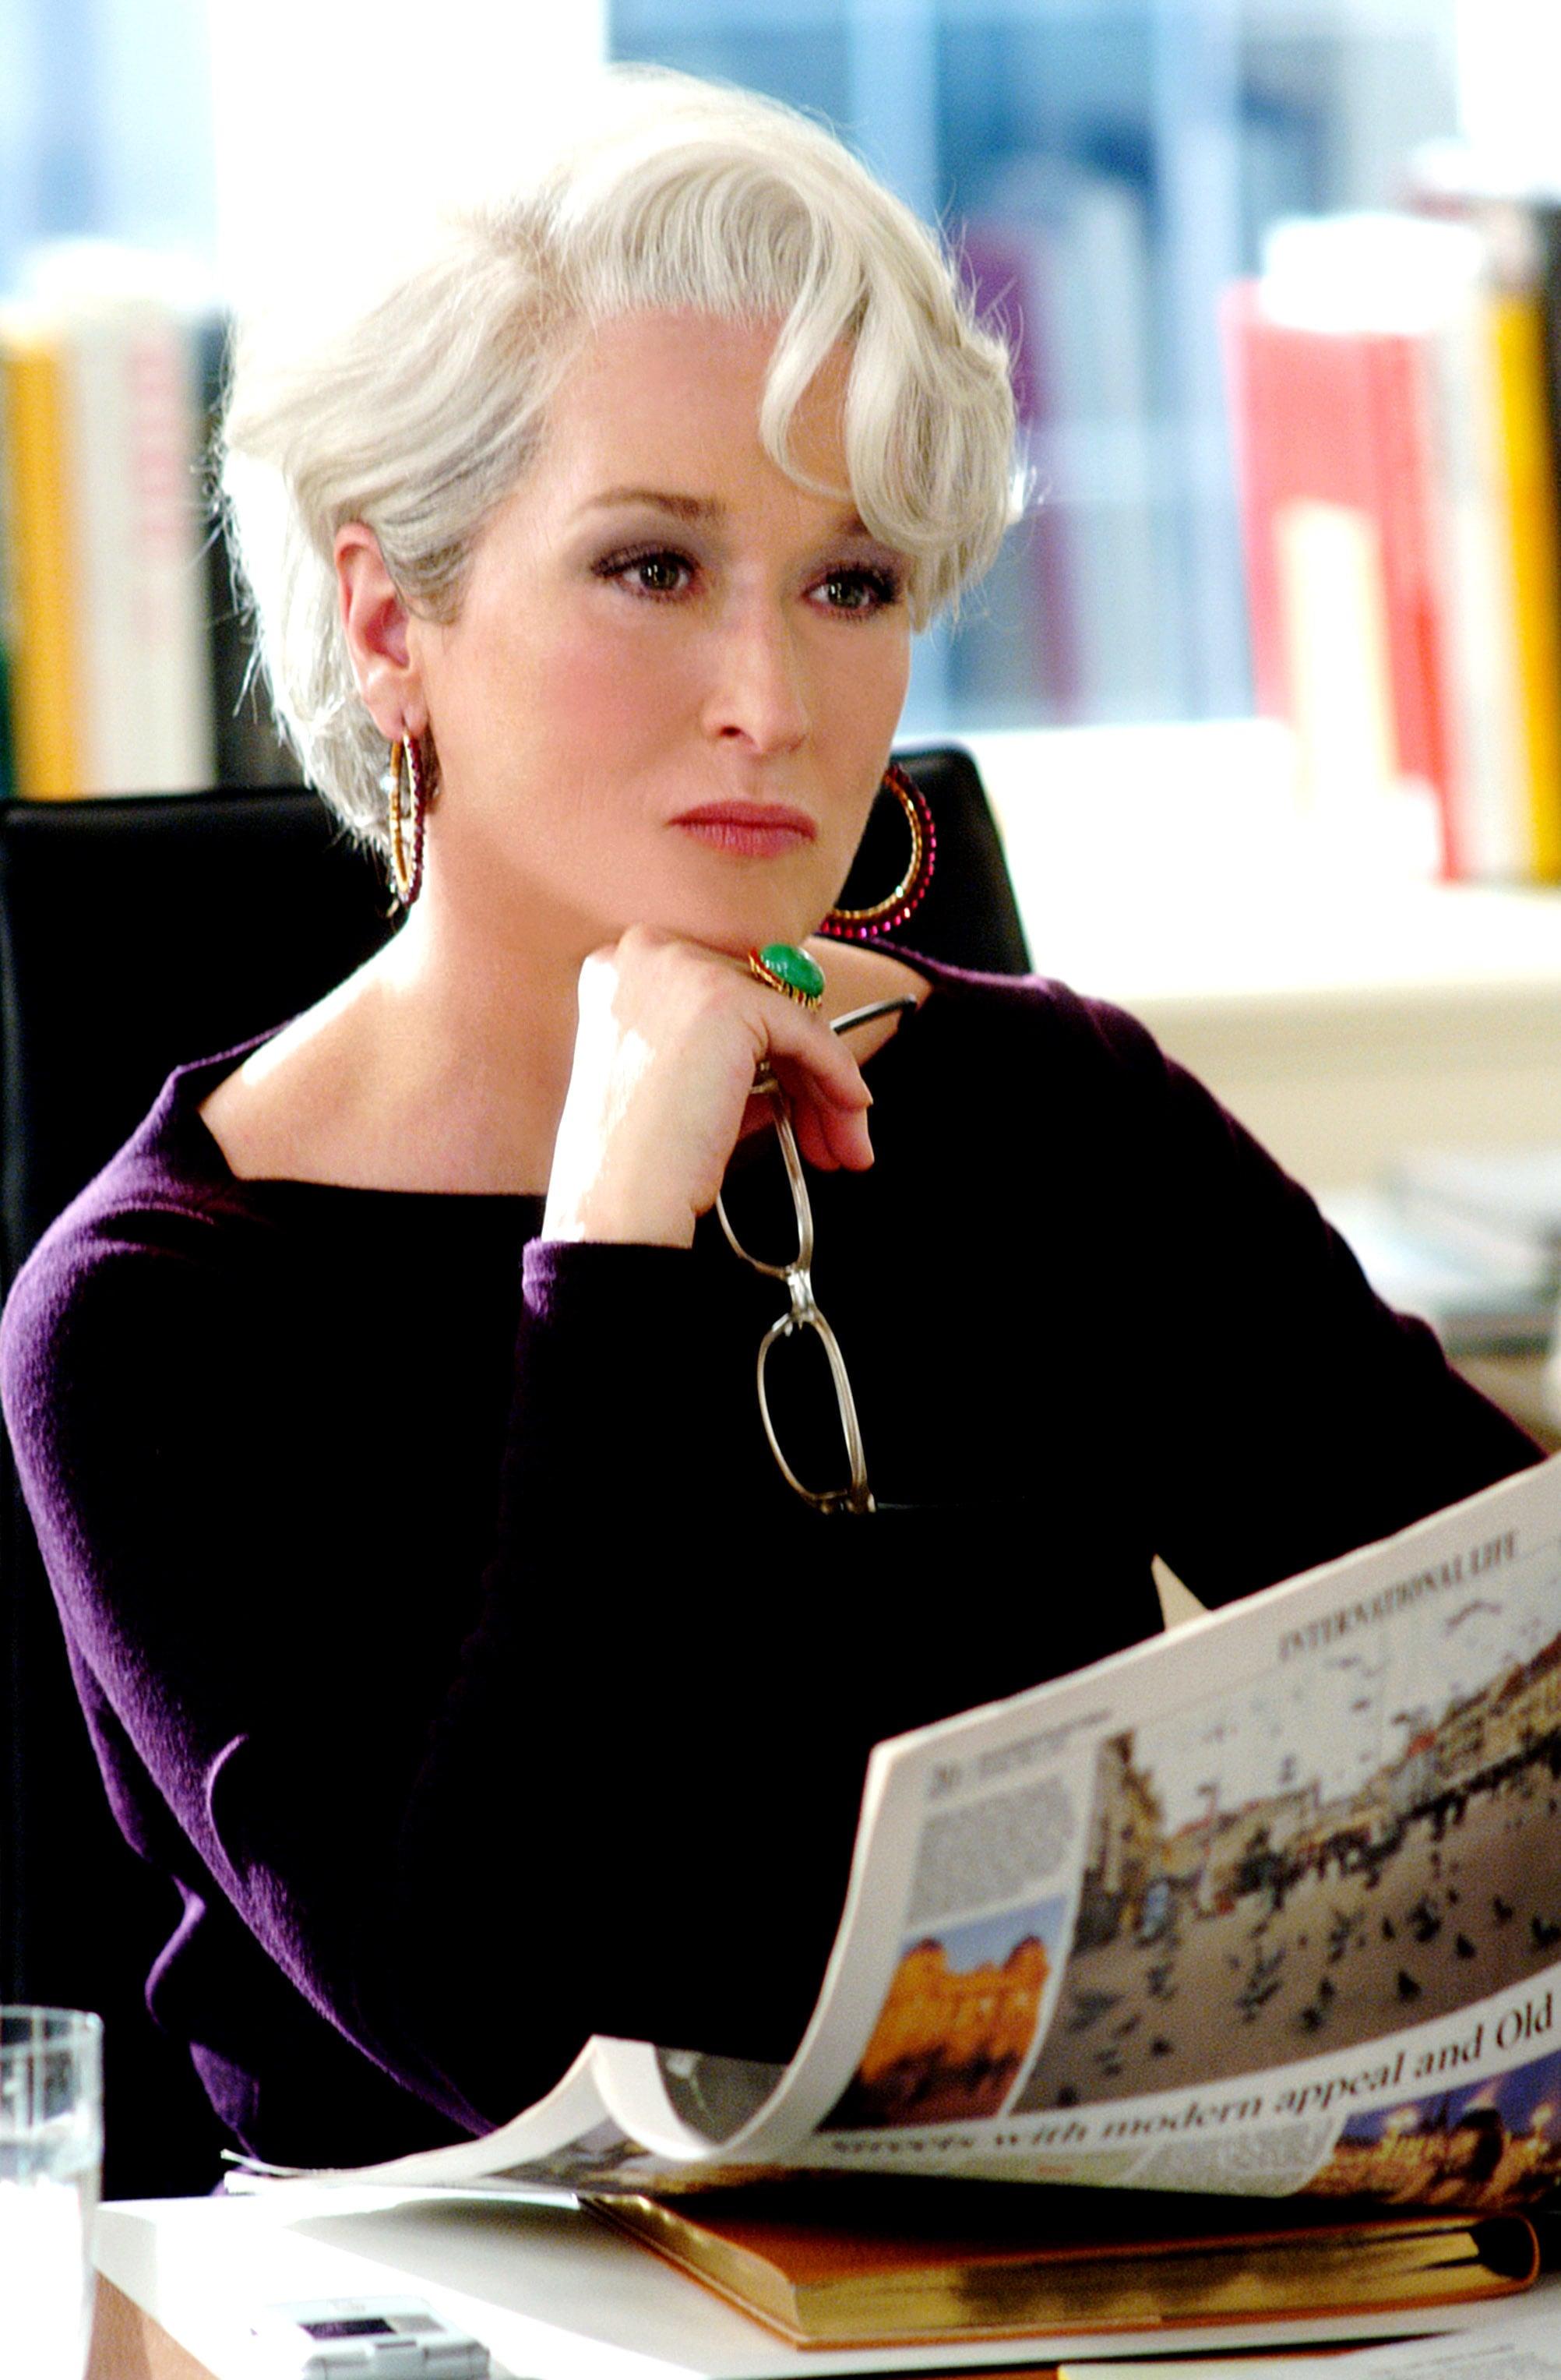 THE DEVIL WEARS PRADA, Meryl Streep, 2006, TM & Copyright (c) 20th Century Fox Film Corp. All rights reserved.